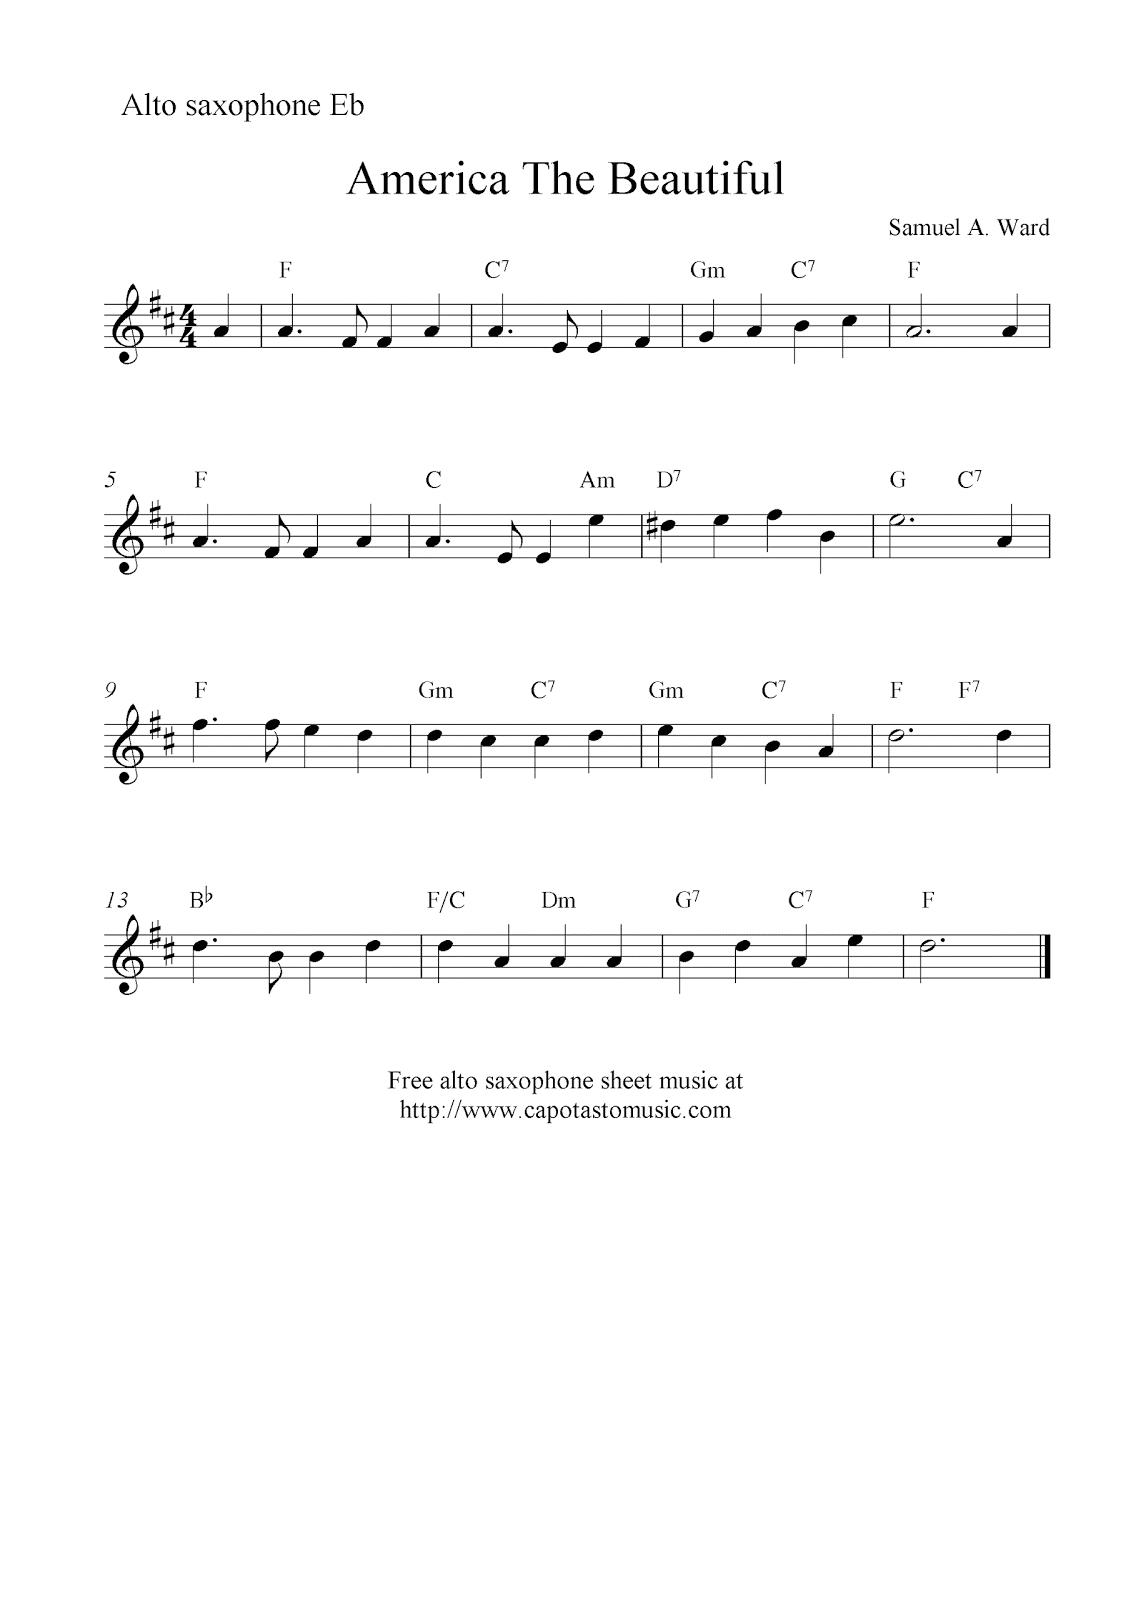 America The Beautiful, Free Alto Saxophone Sheet Music Notes - Free Printable Alto Saxophone Sheet Music